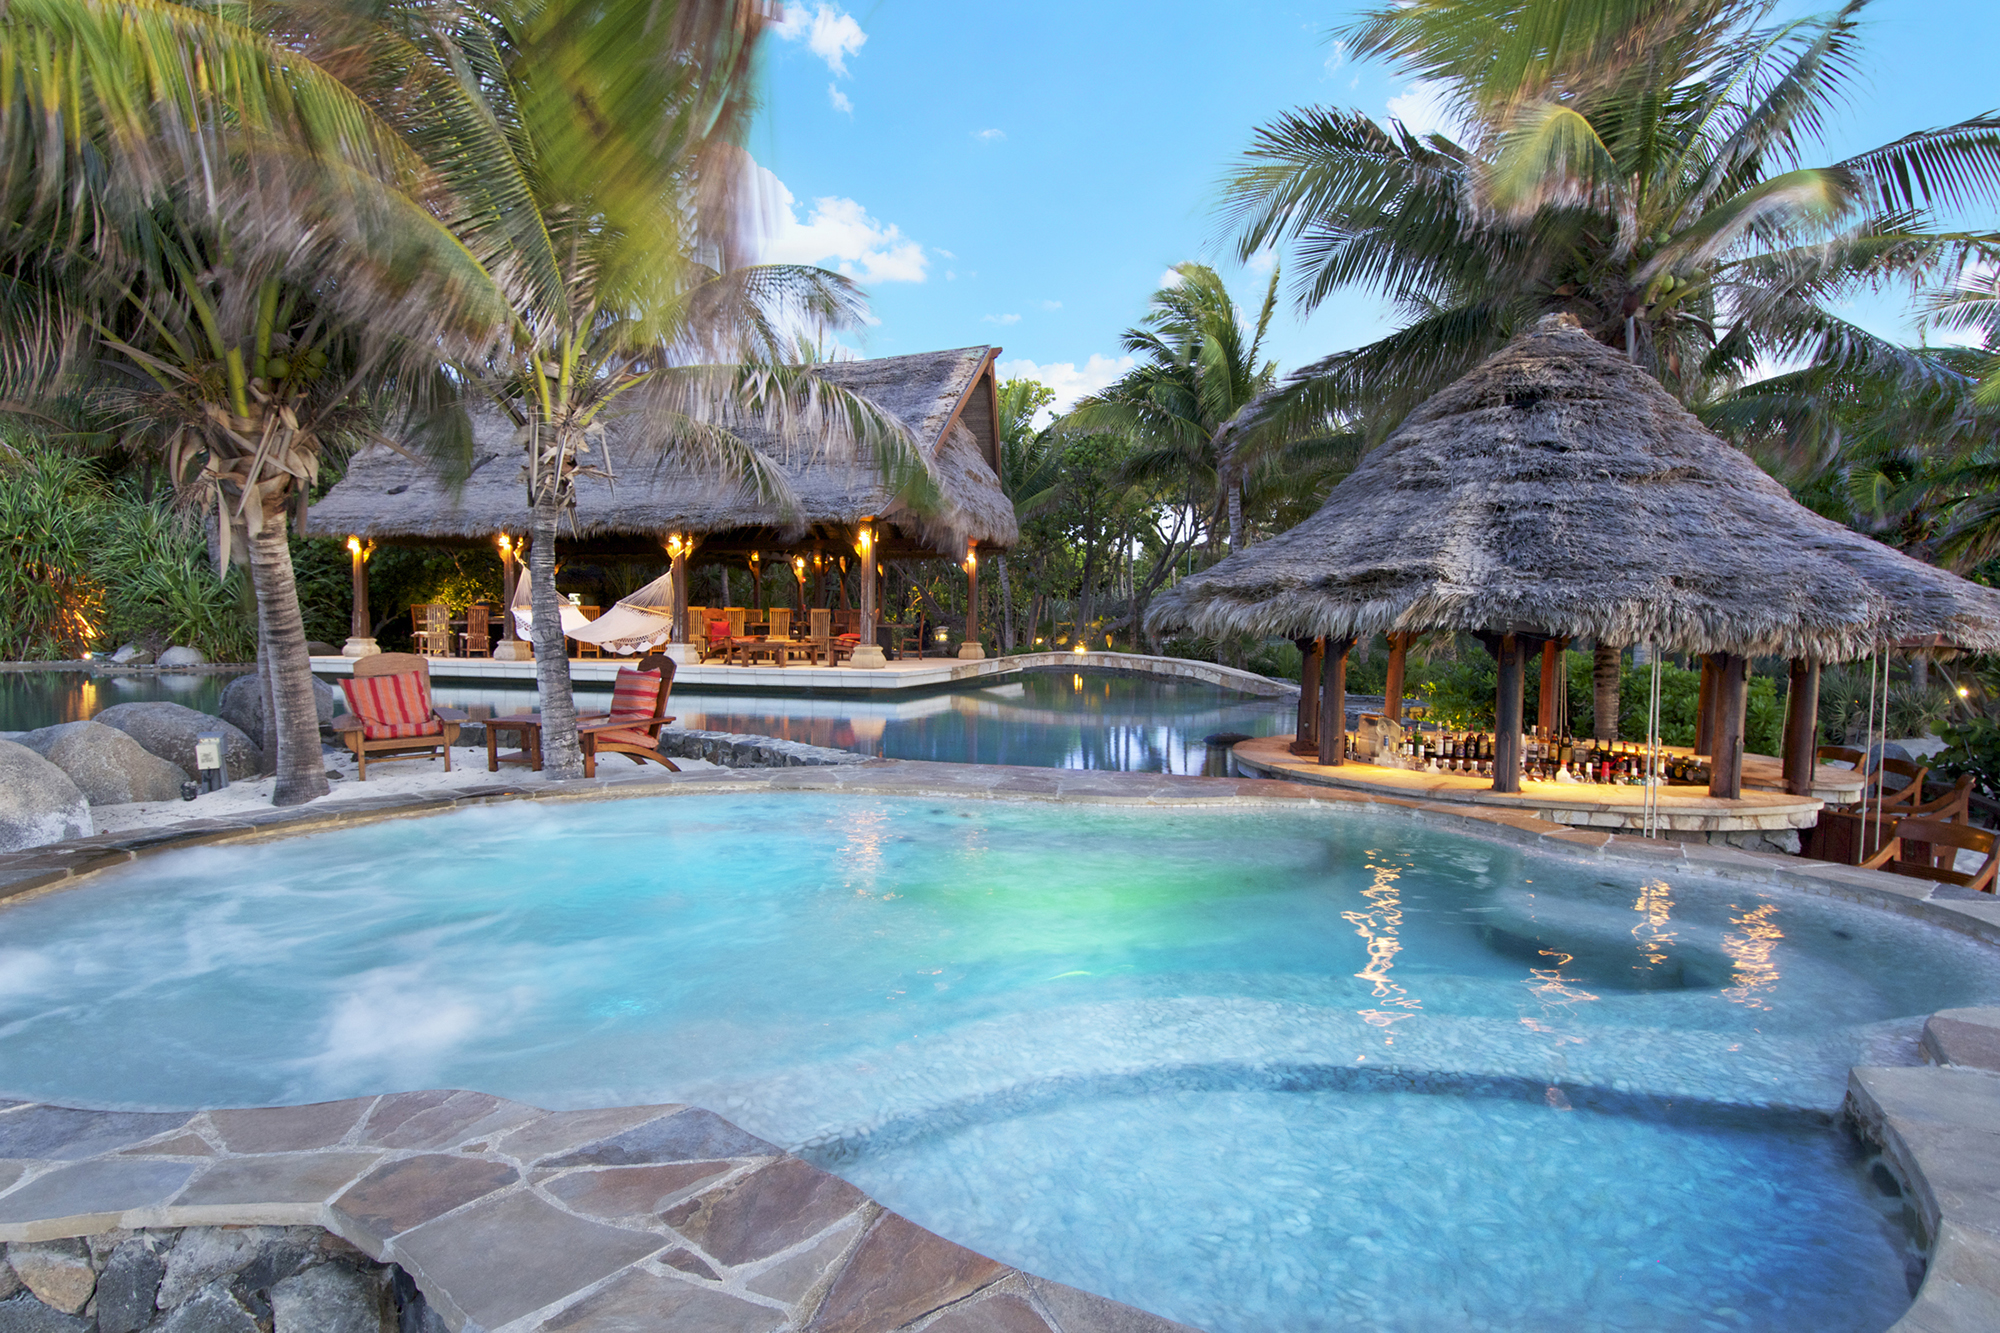 necker-island-beach-pool-jacuzzi.jpg